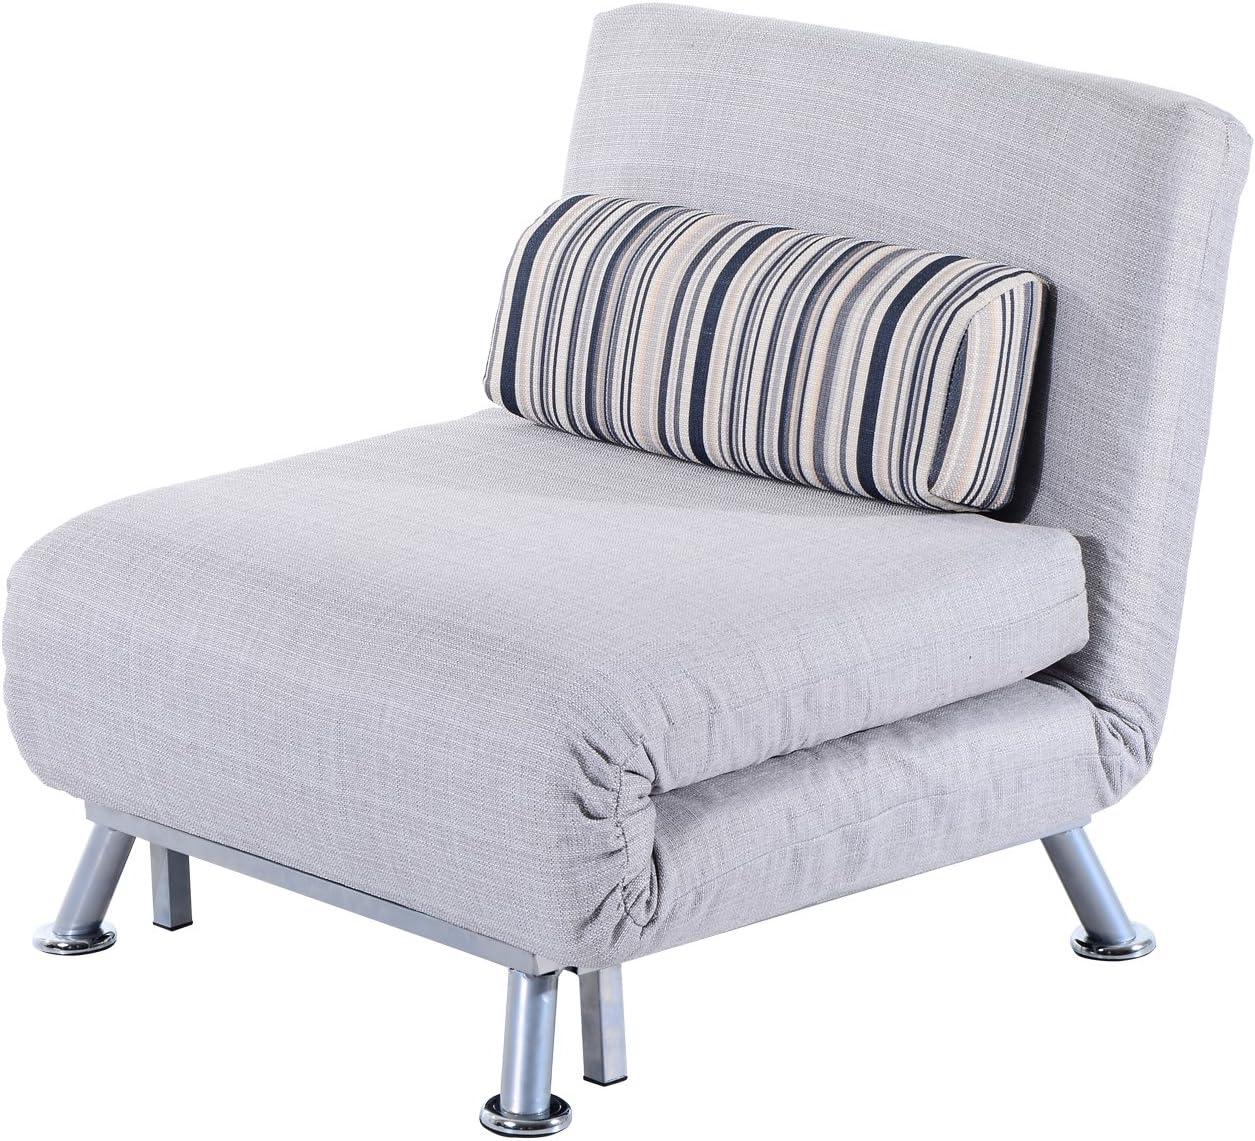 - HOMCOM Fold Out Futon Single Sofa Bed: Amazon.co.uk: Kitchen & Home